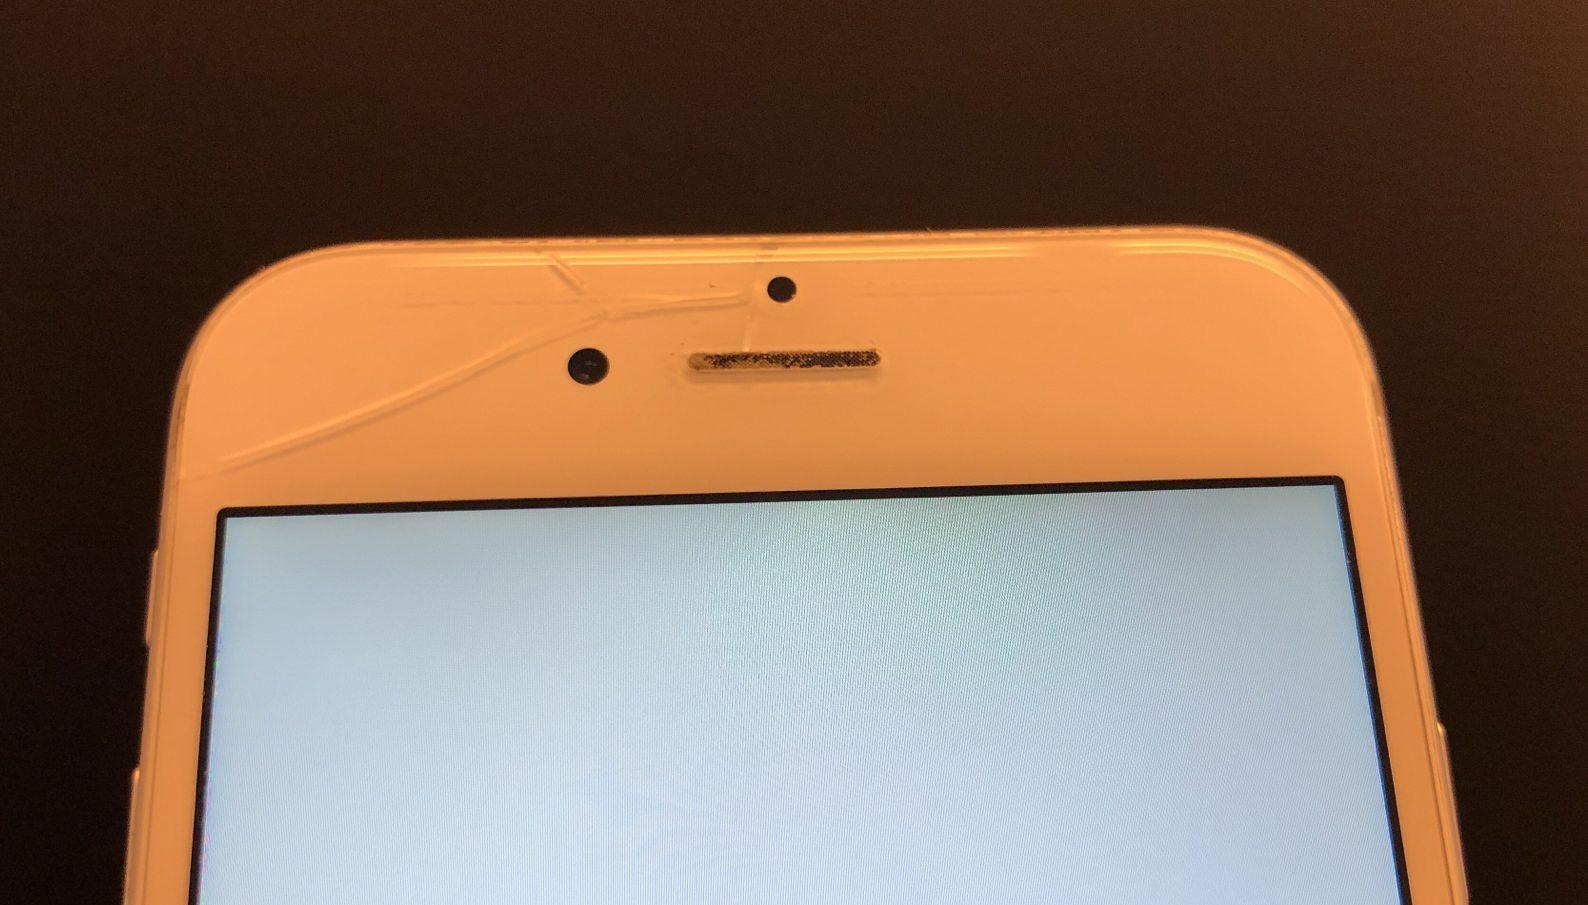 iPhone 6 16GB, 16GB, Silver, bild 4